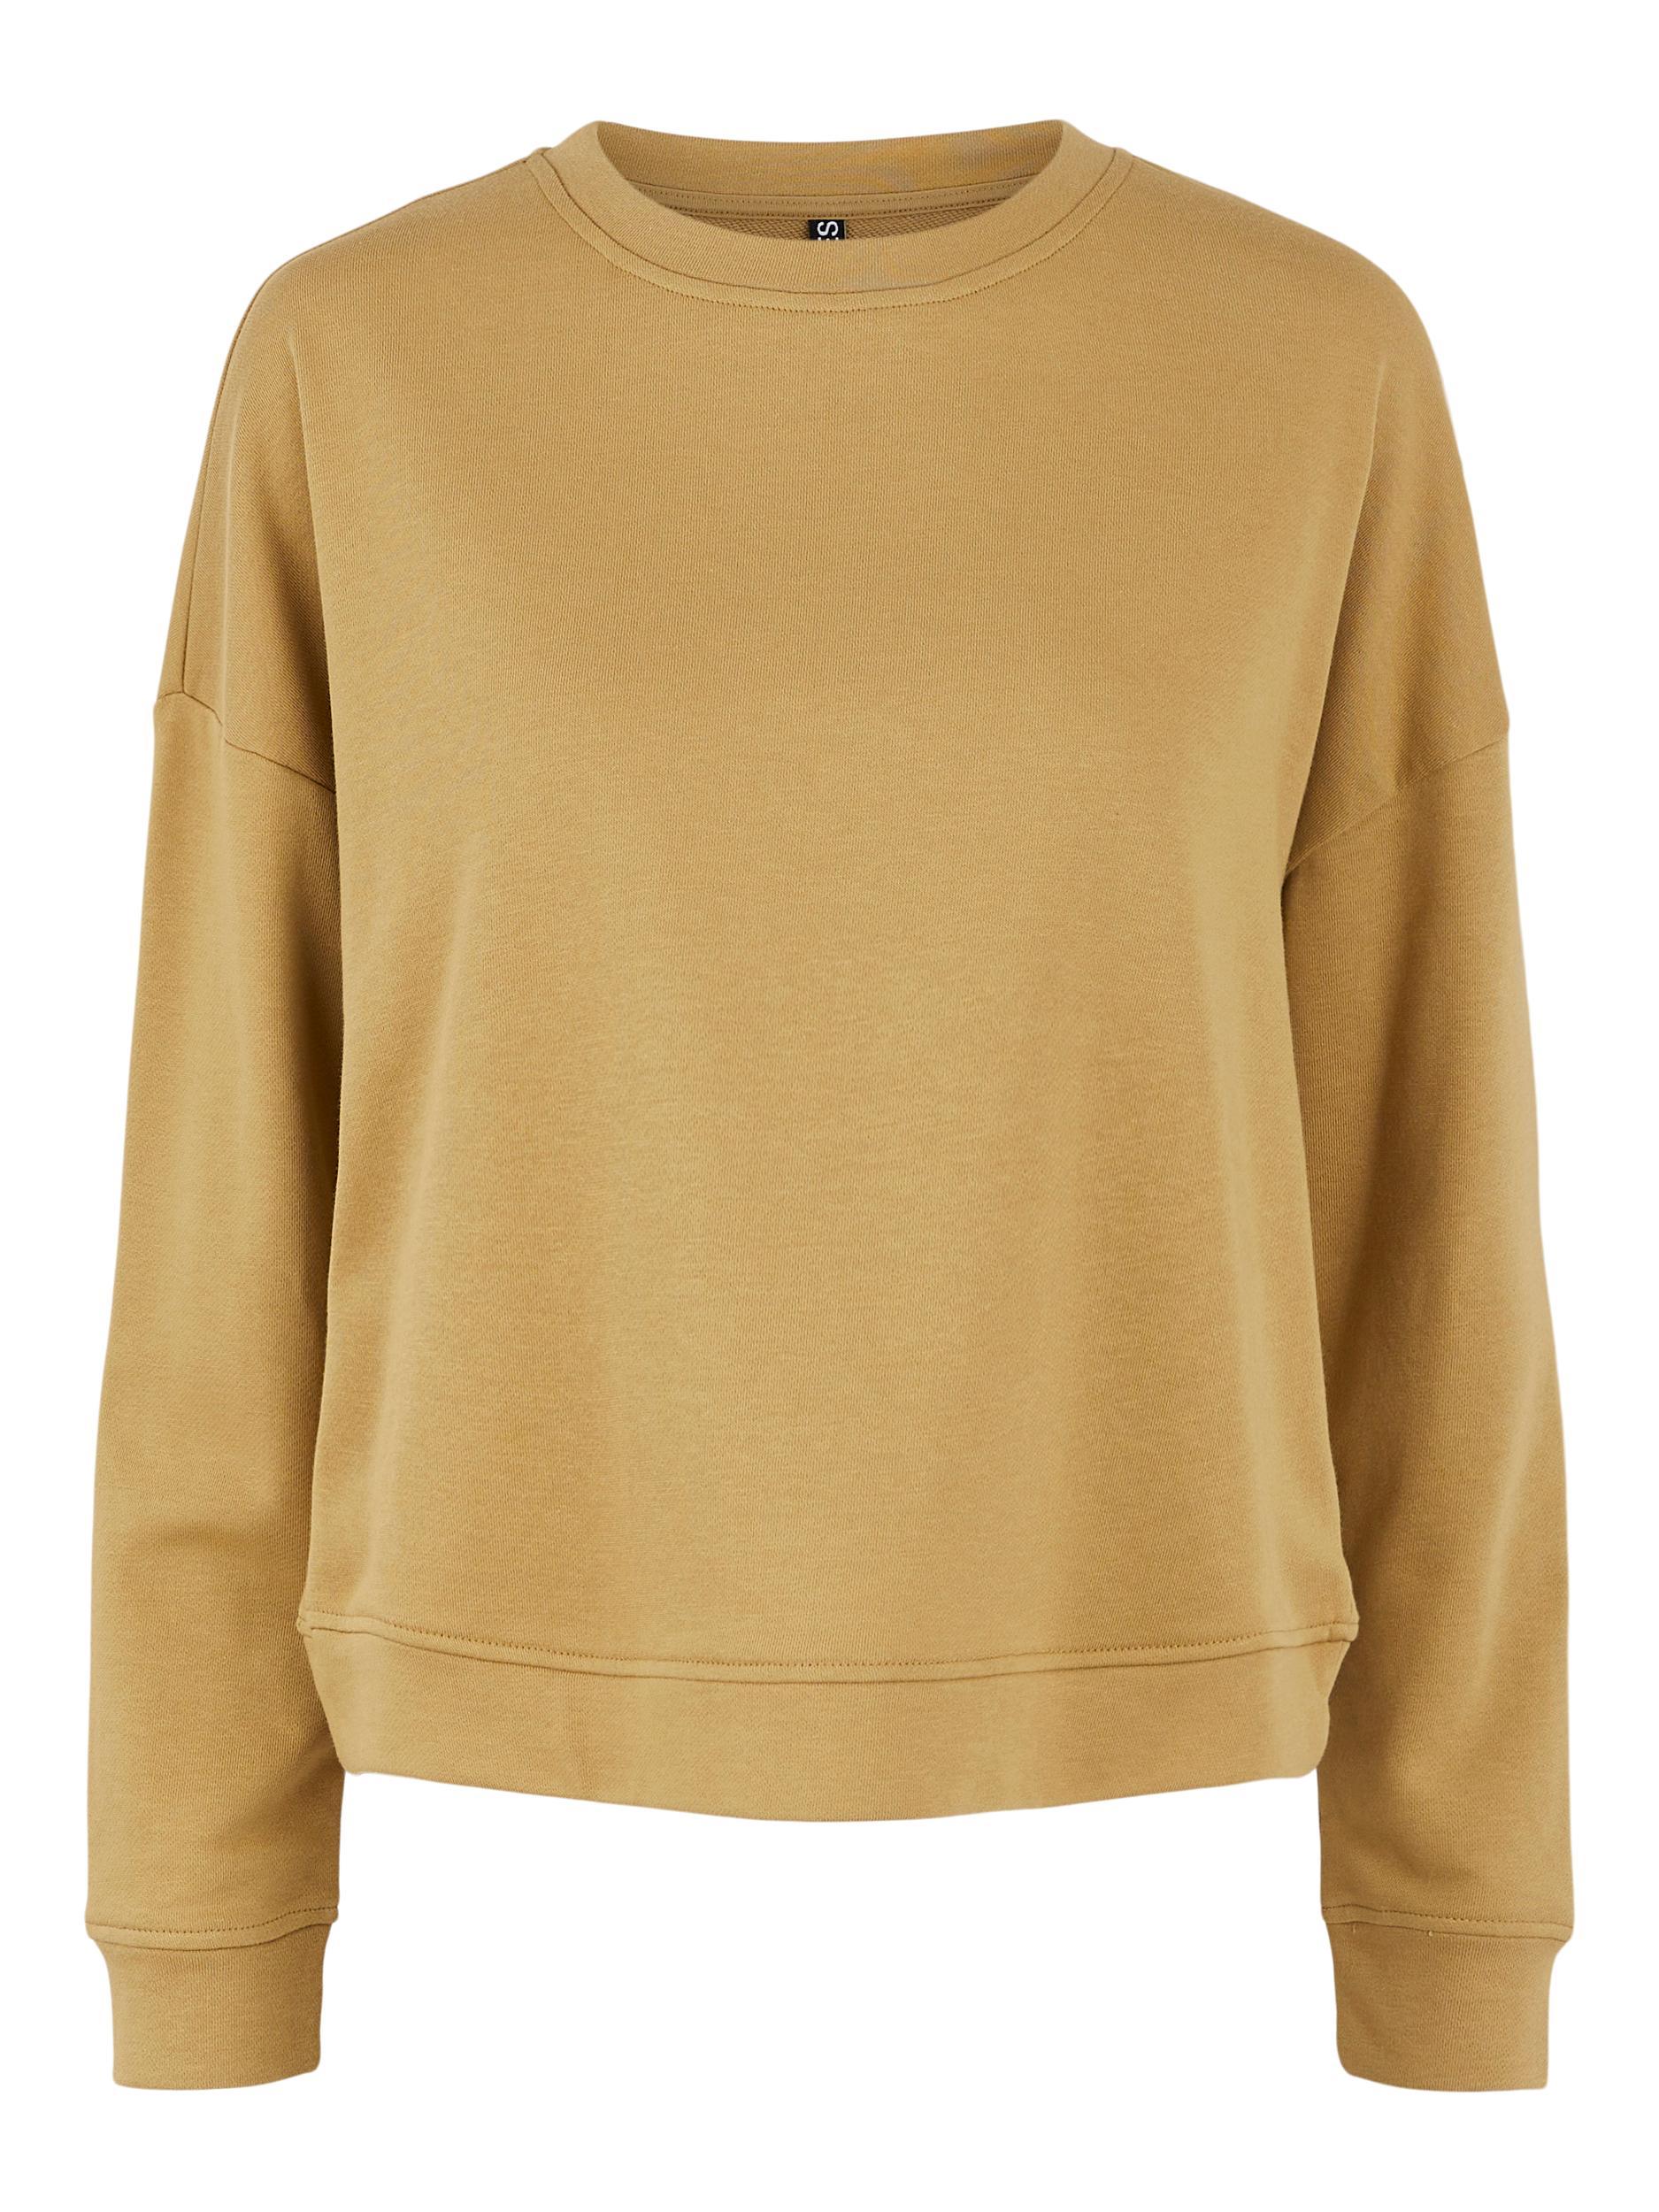 Pieces Chilli Summer sweatshirt, khaki, large